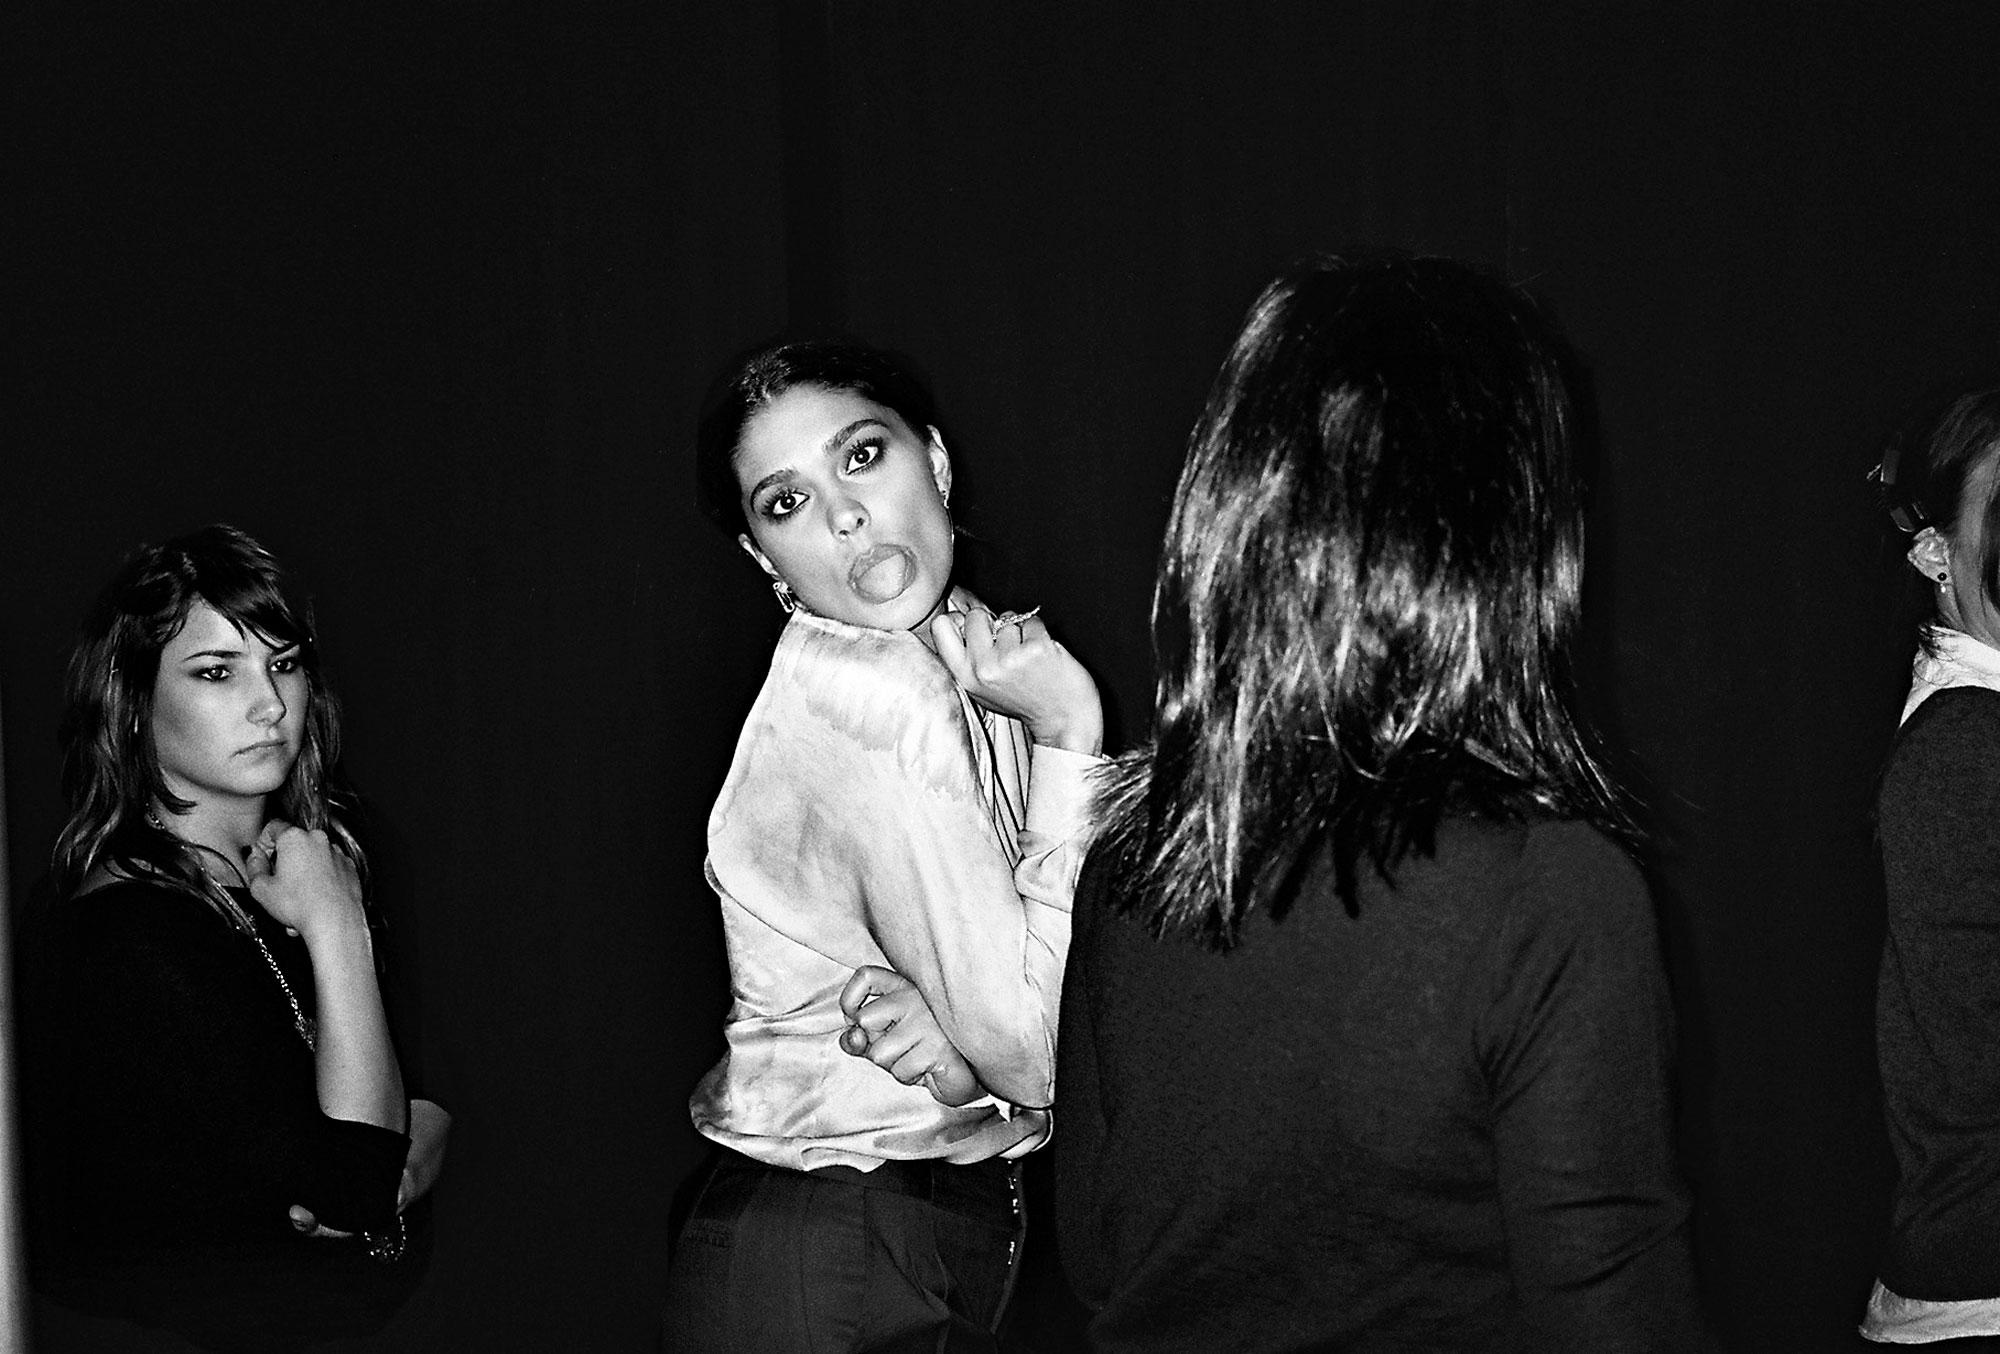 Rachel Roy, Fashion show, backstage, interview